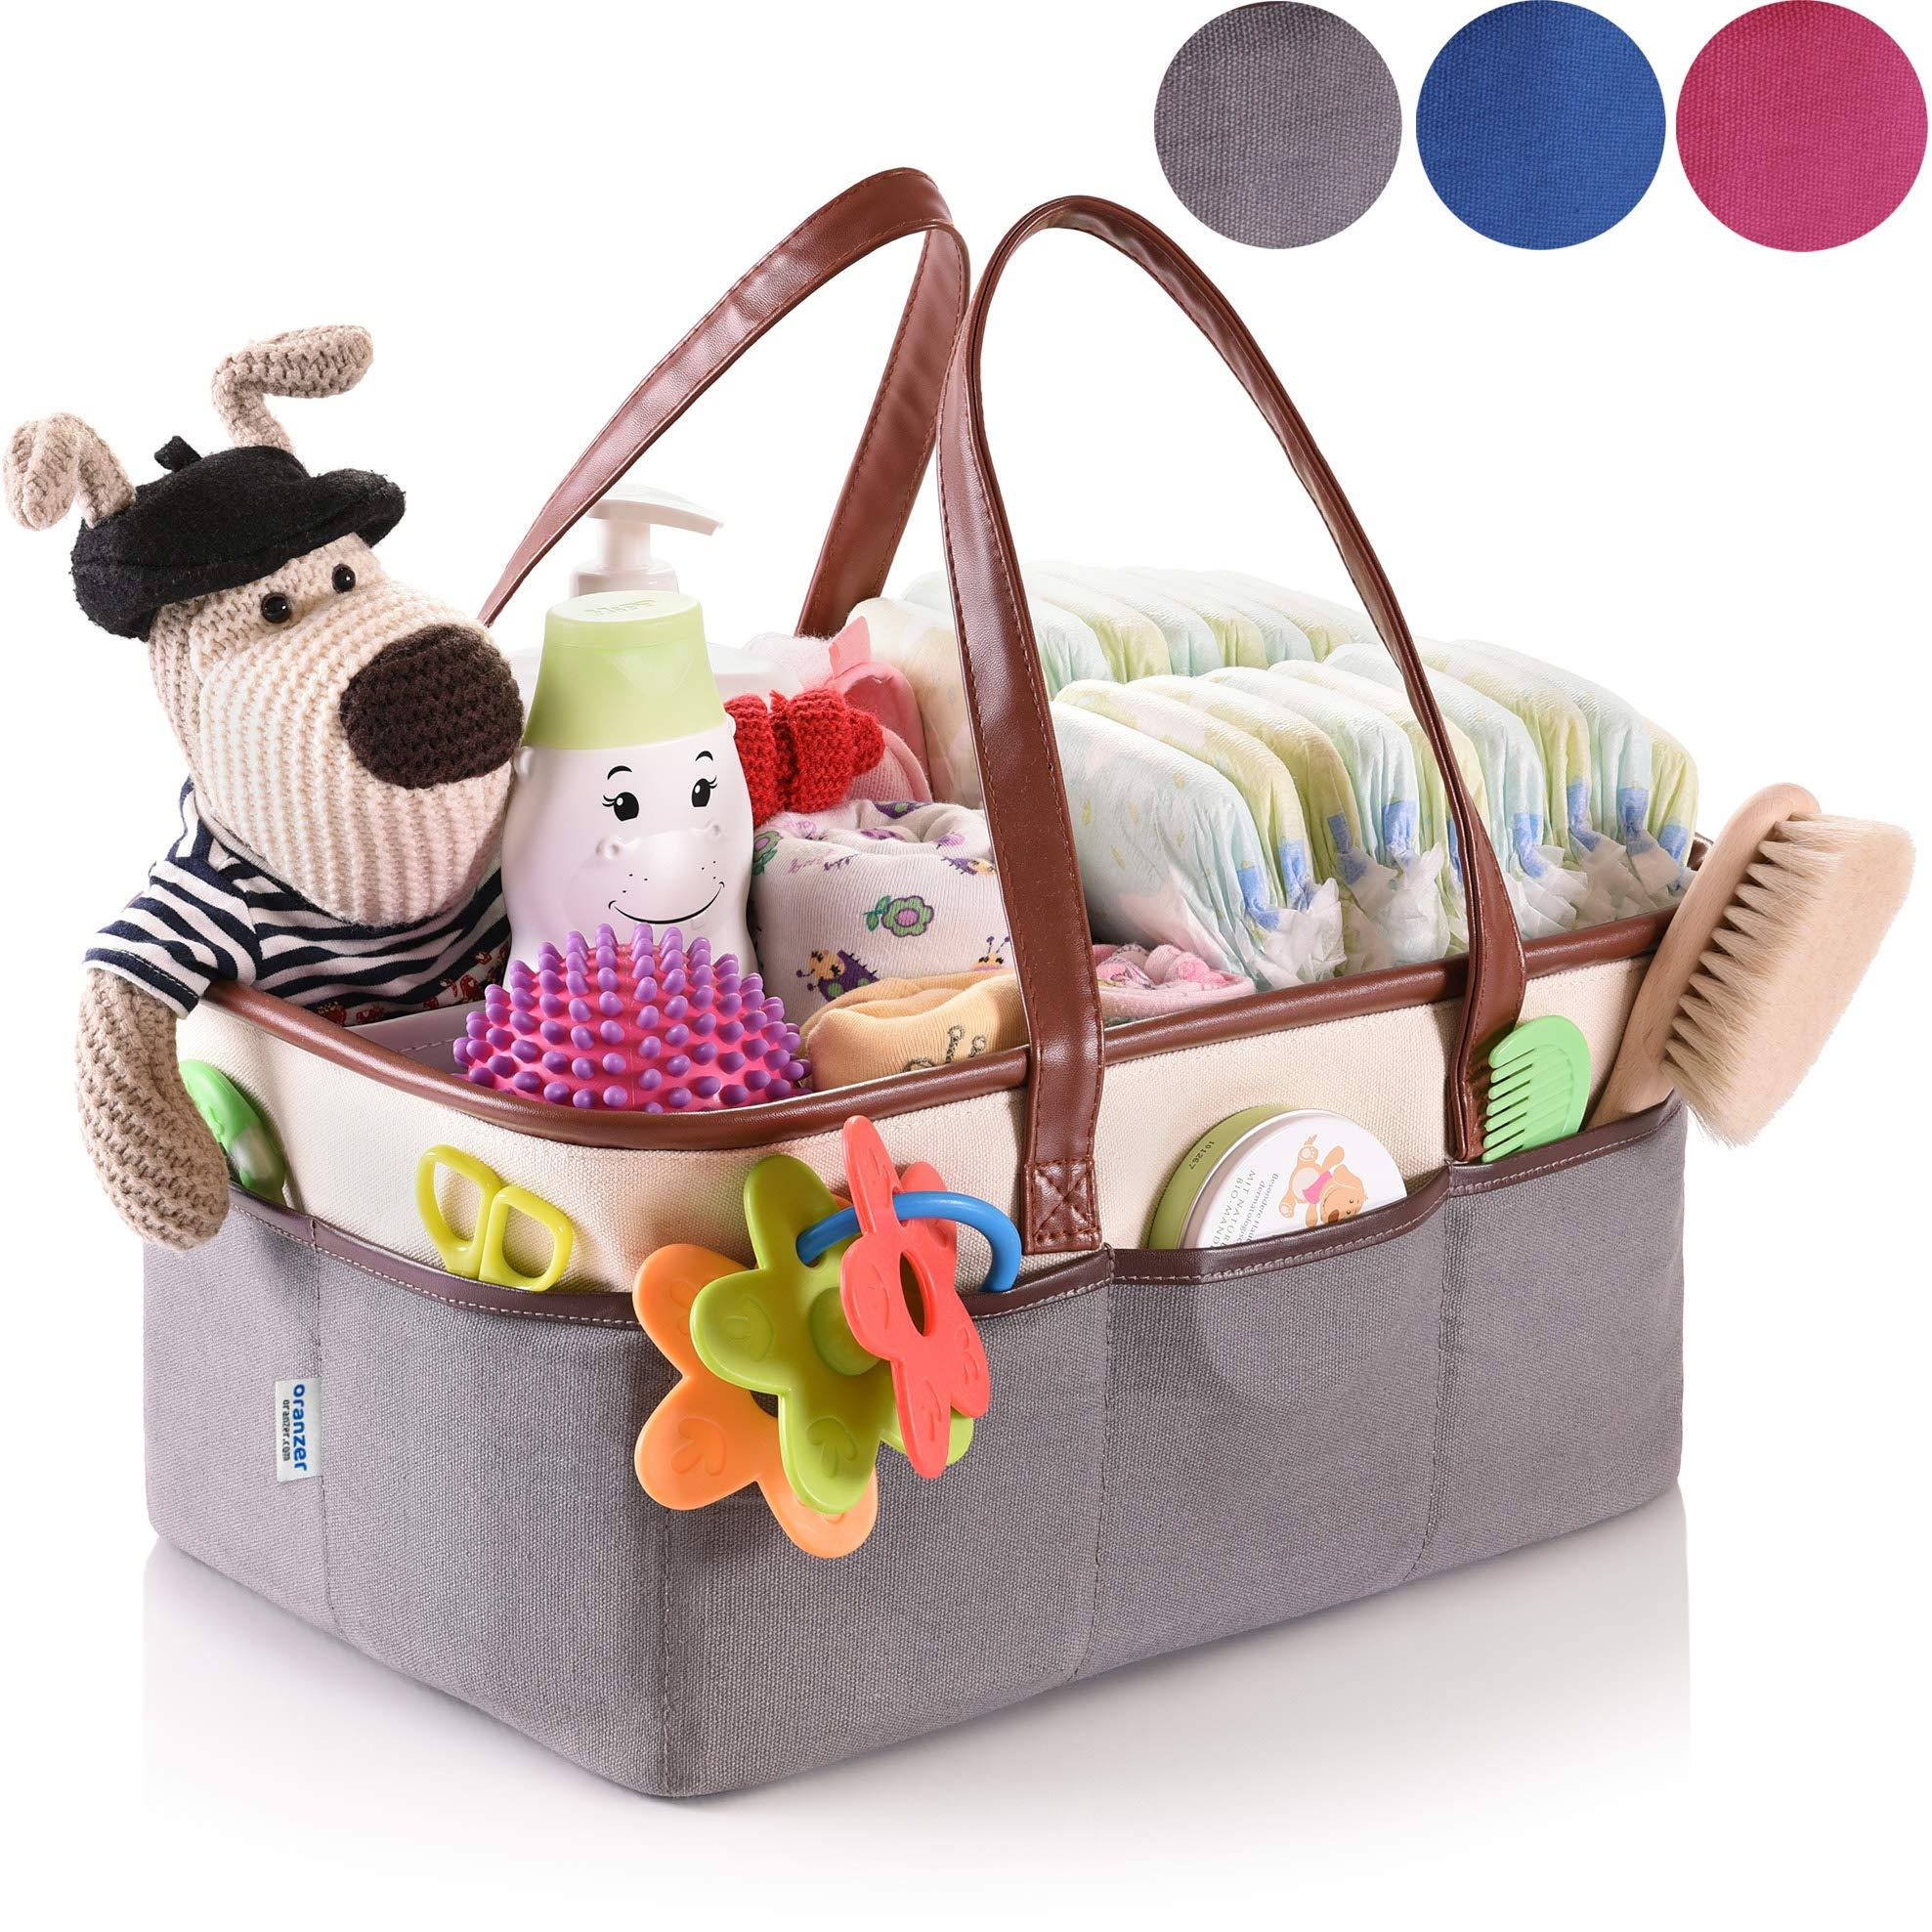 Baby Diaper Caddy Organizer - Nursery Essentials Storage - Portable Bag for Car by Oranzer